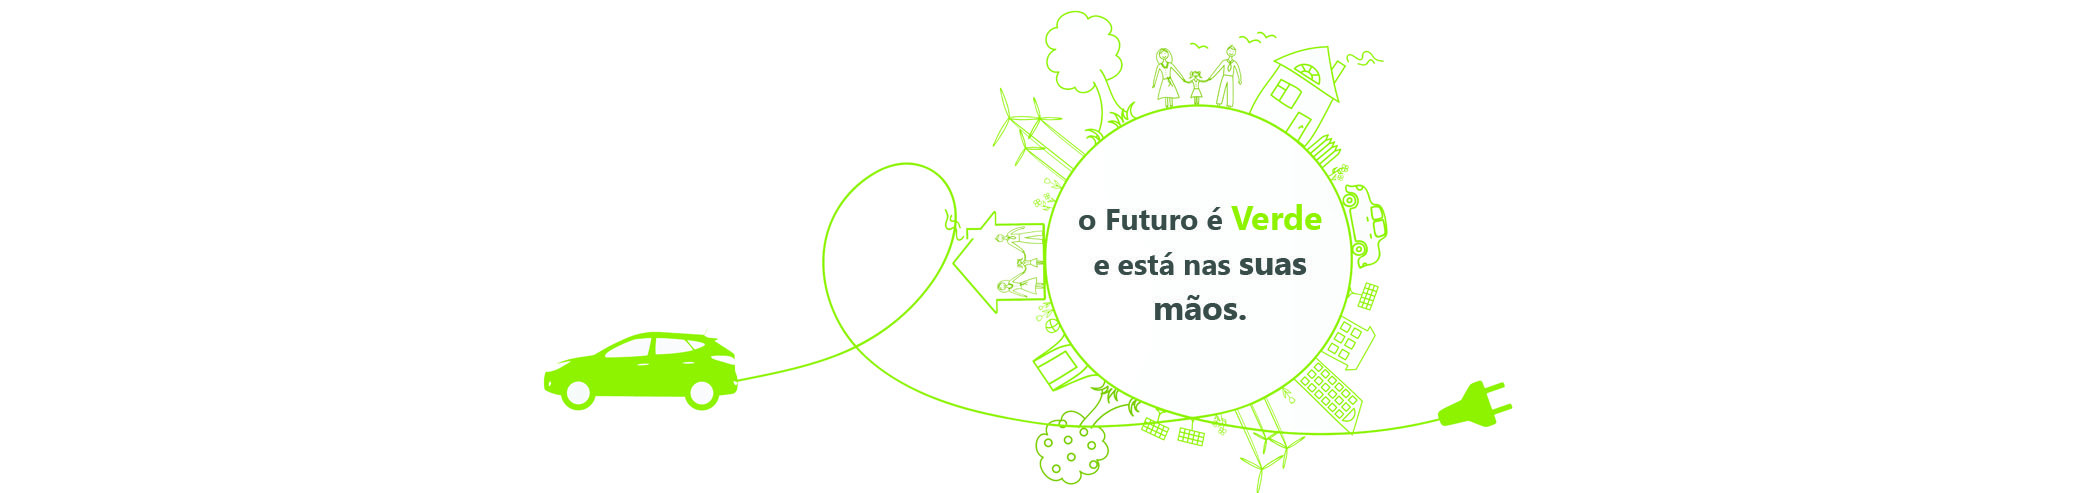 Campanha Futuro Verde